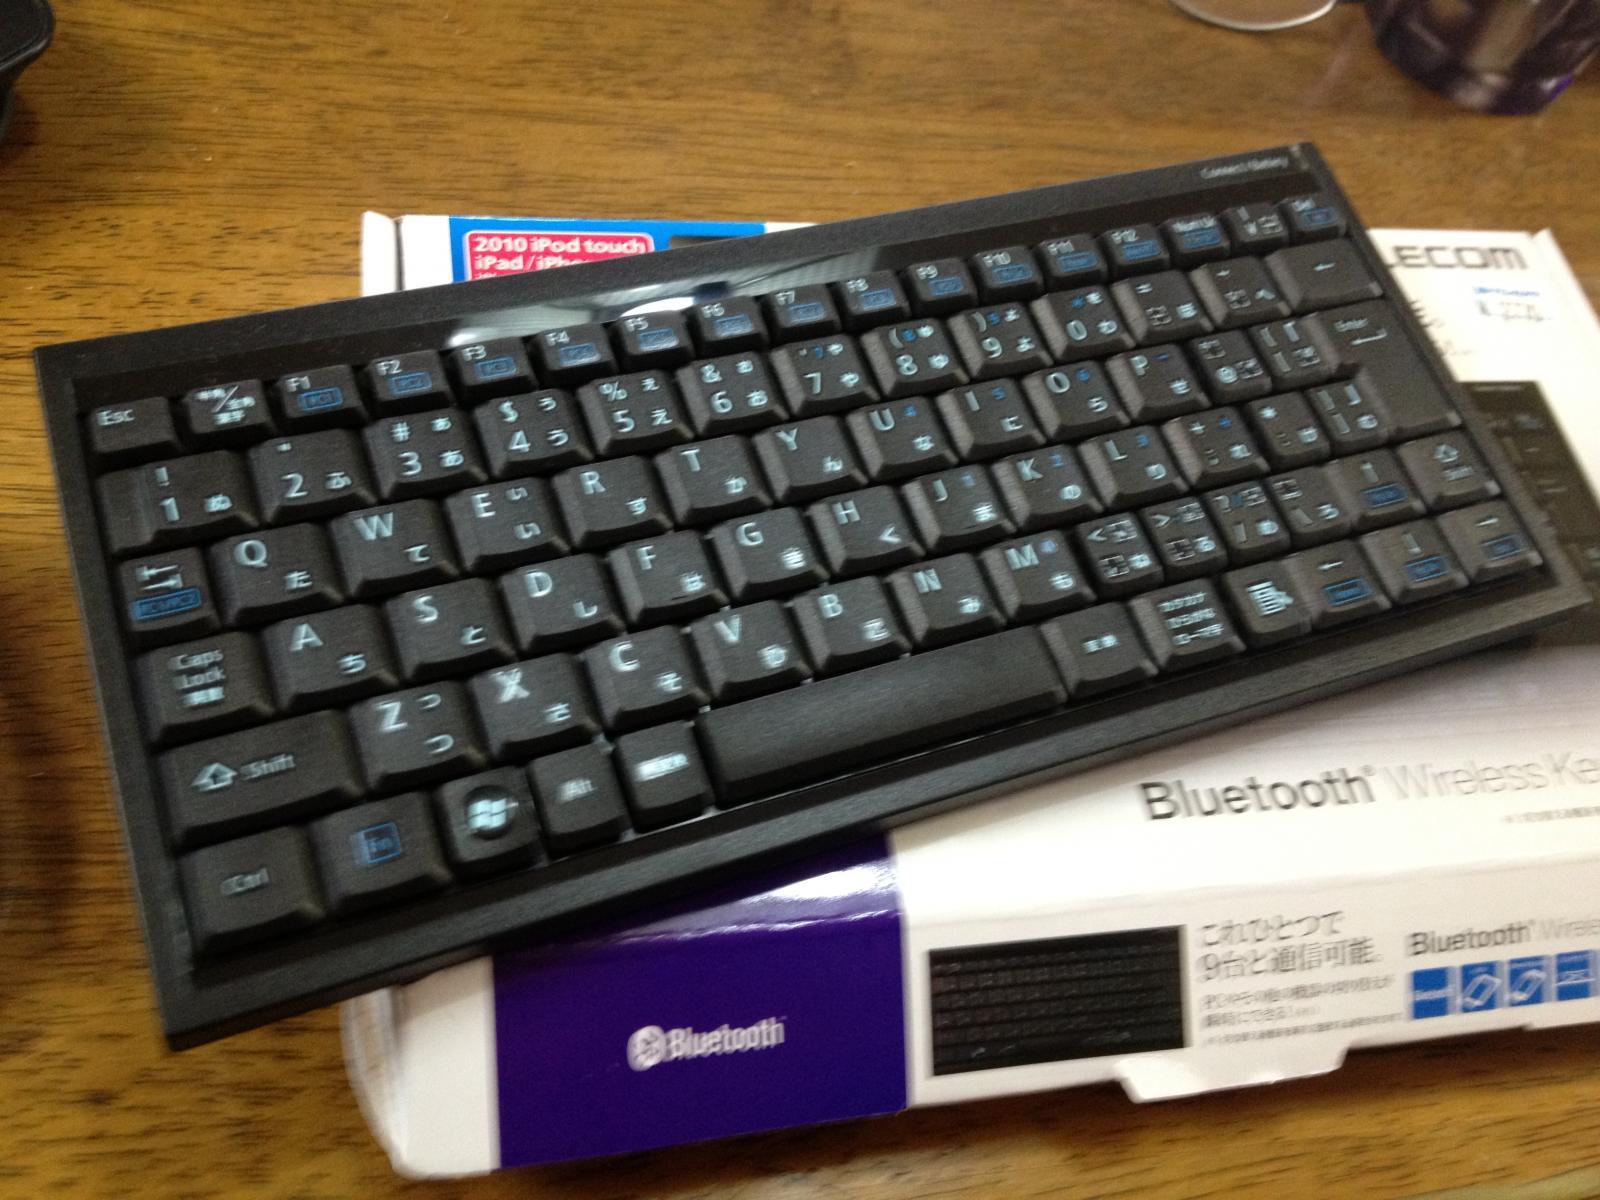 Elecom bluetooth wireless keyboard TK-FBP013BK